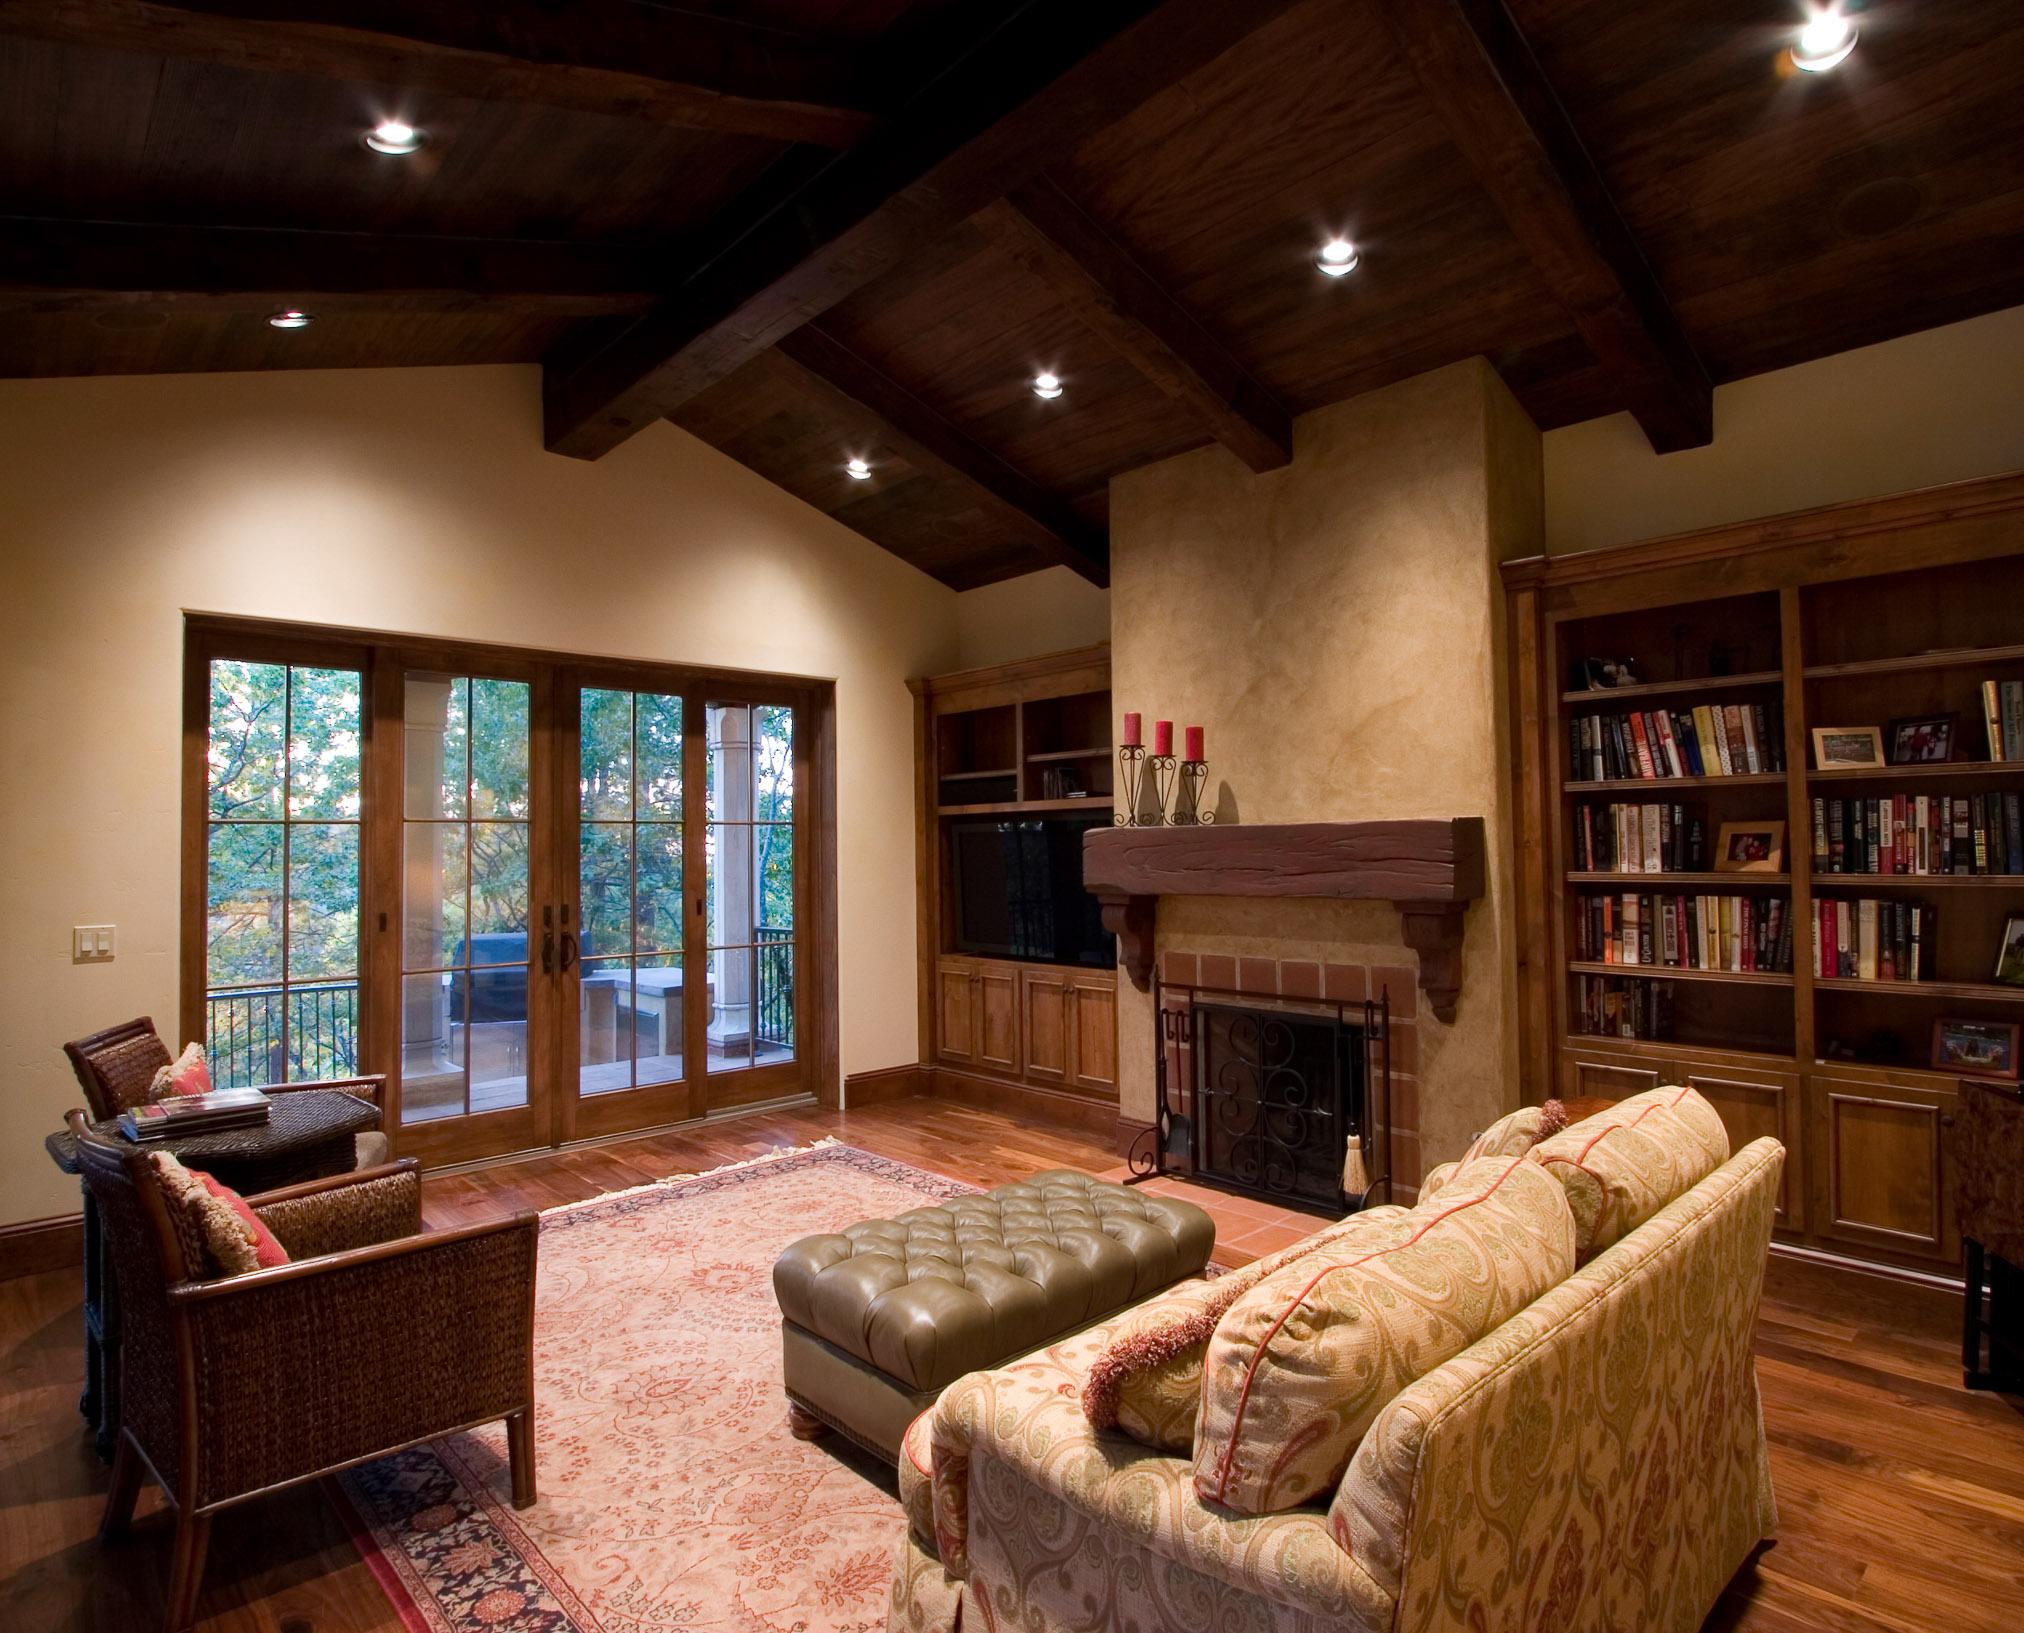 Northern California Santa Barbara Home Builder-1.jpg